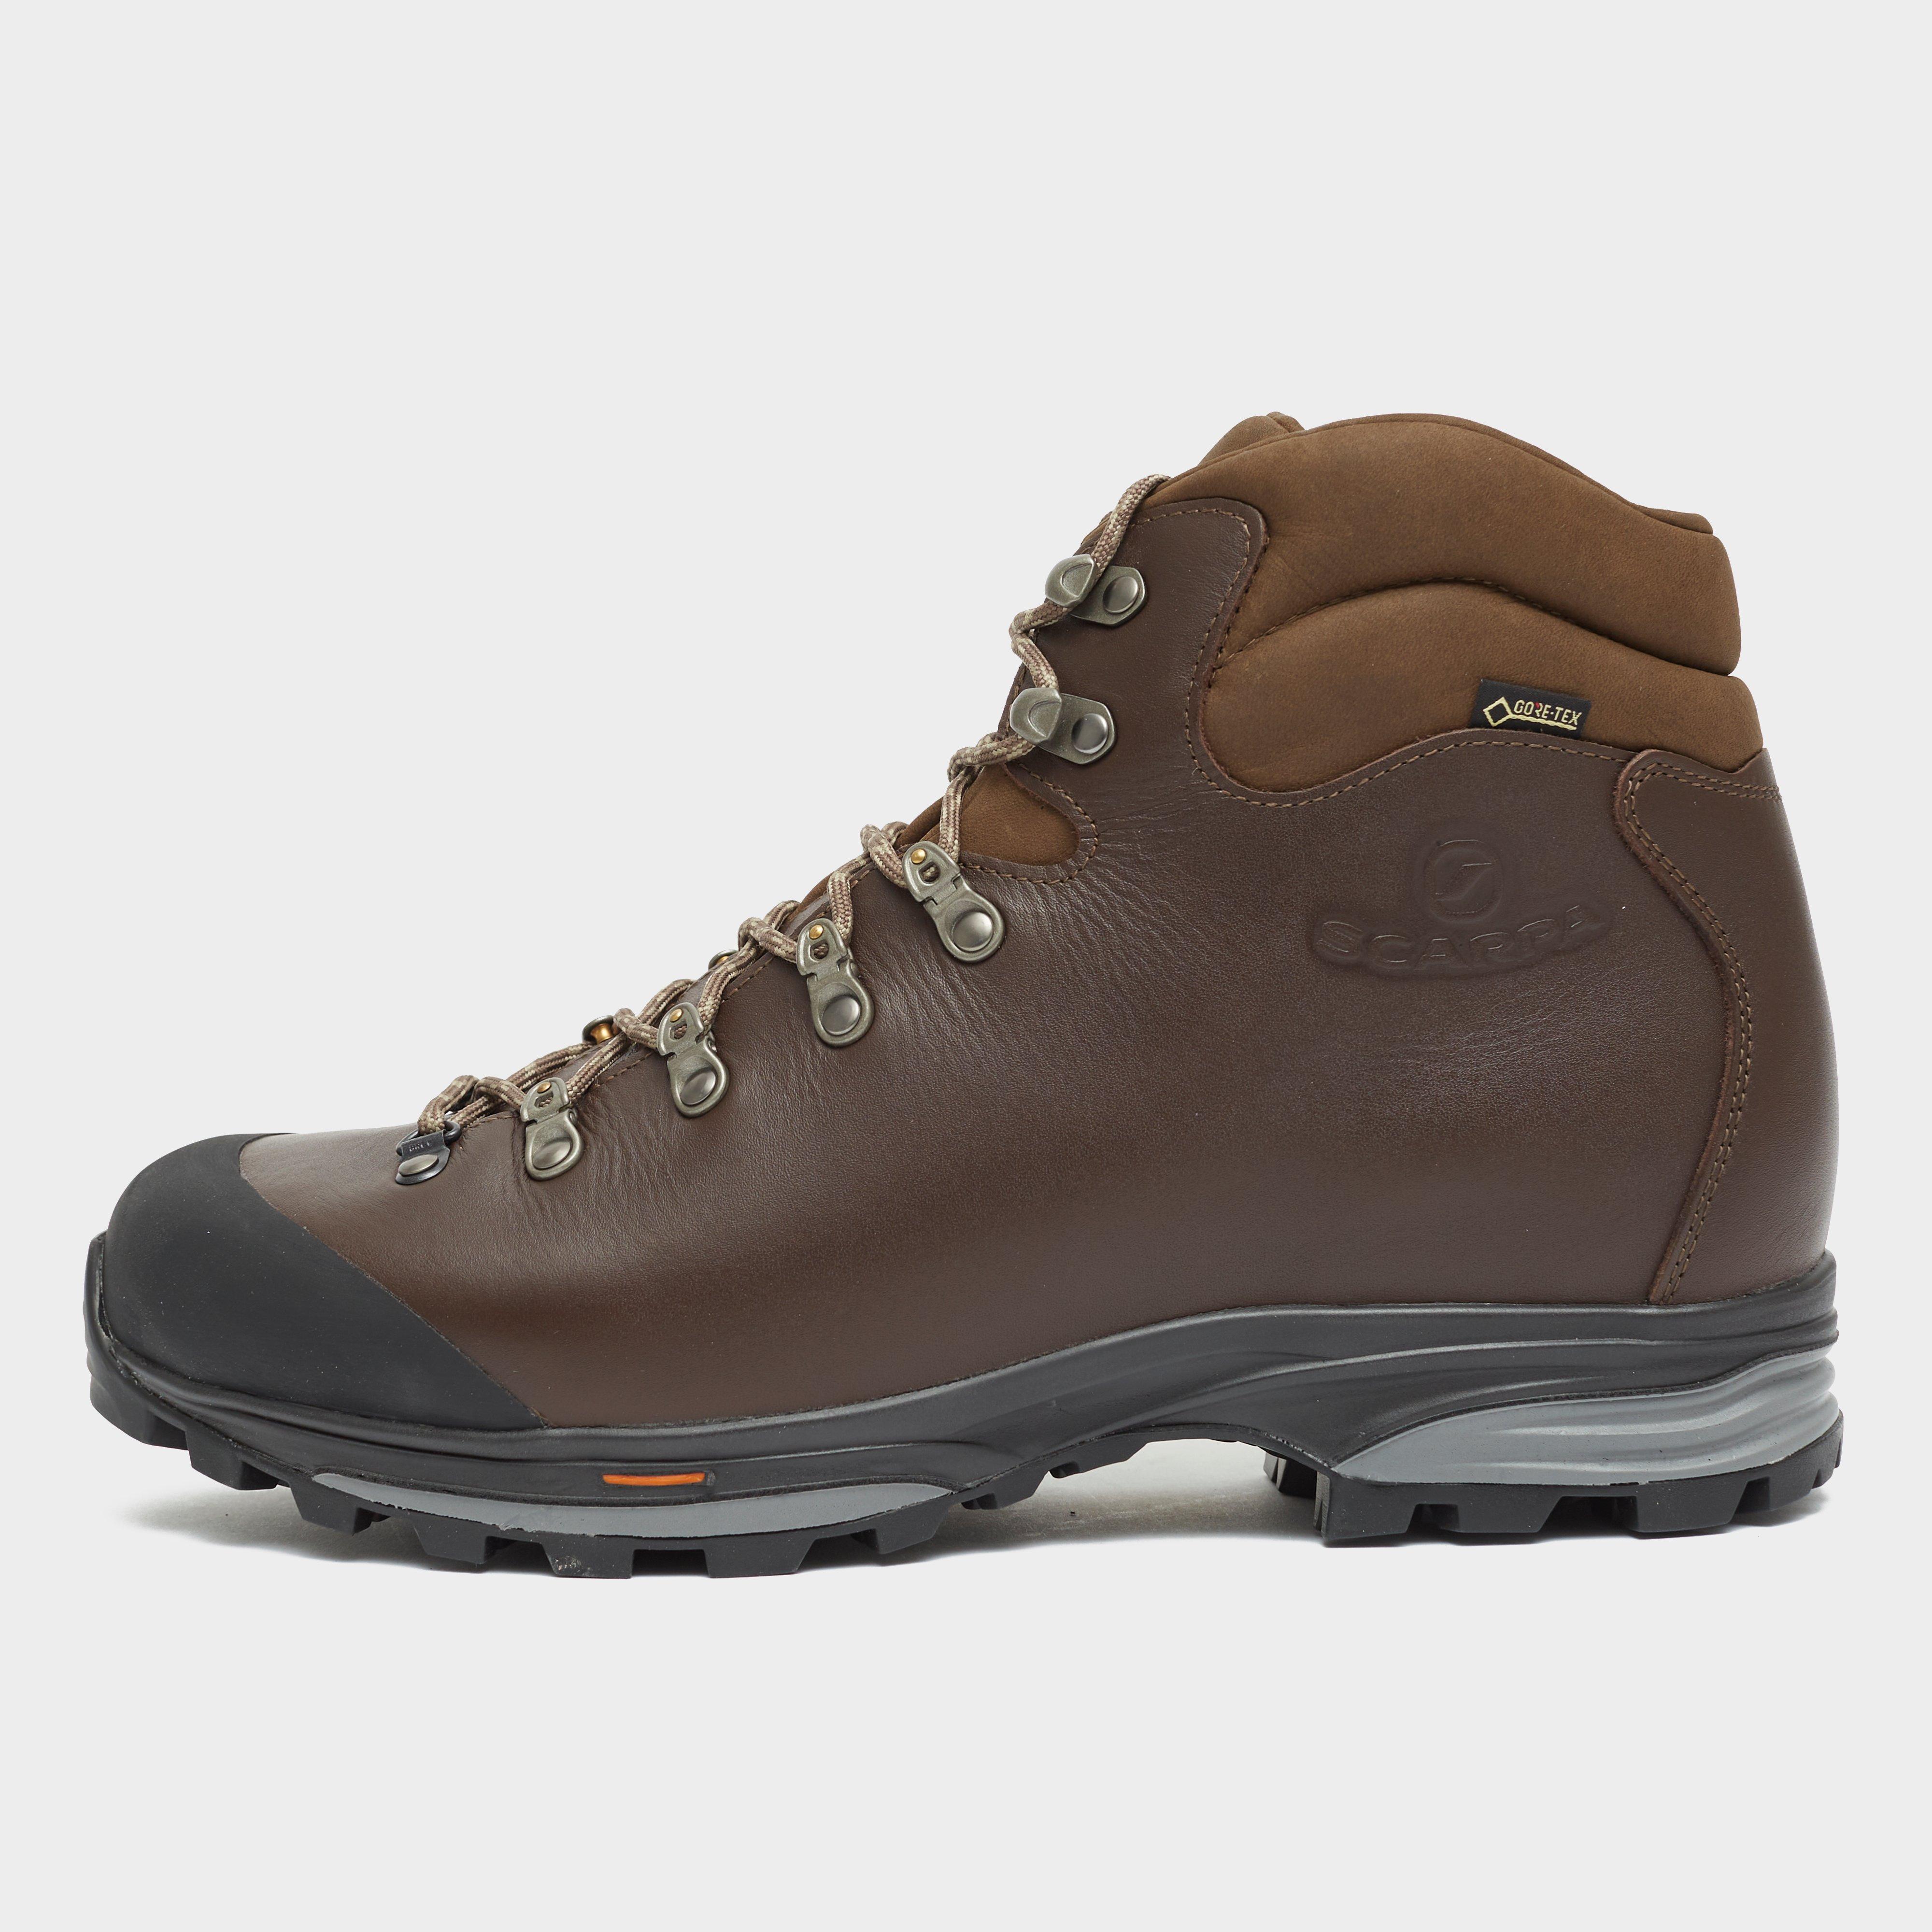 Scarpa Mens Delta Gore-tex  Walking Boots - Brown/brown  Brown/brown